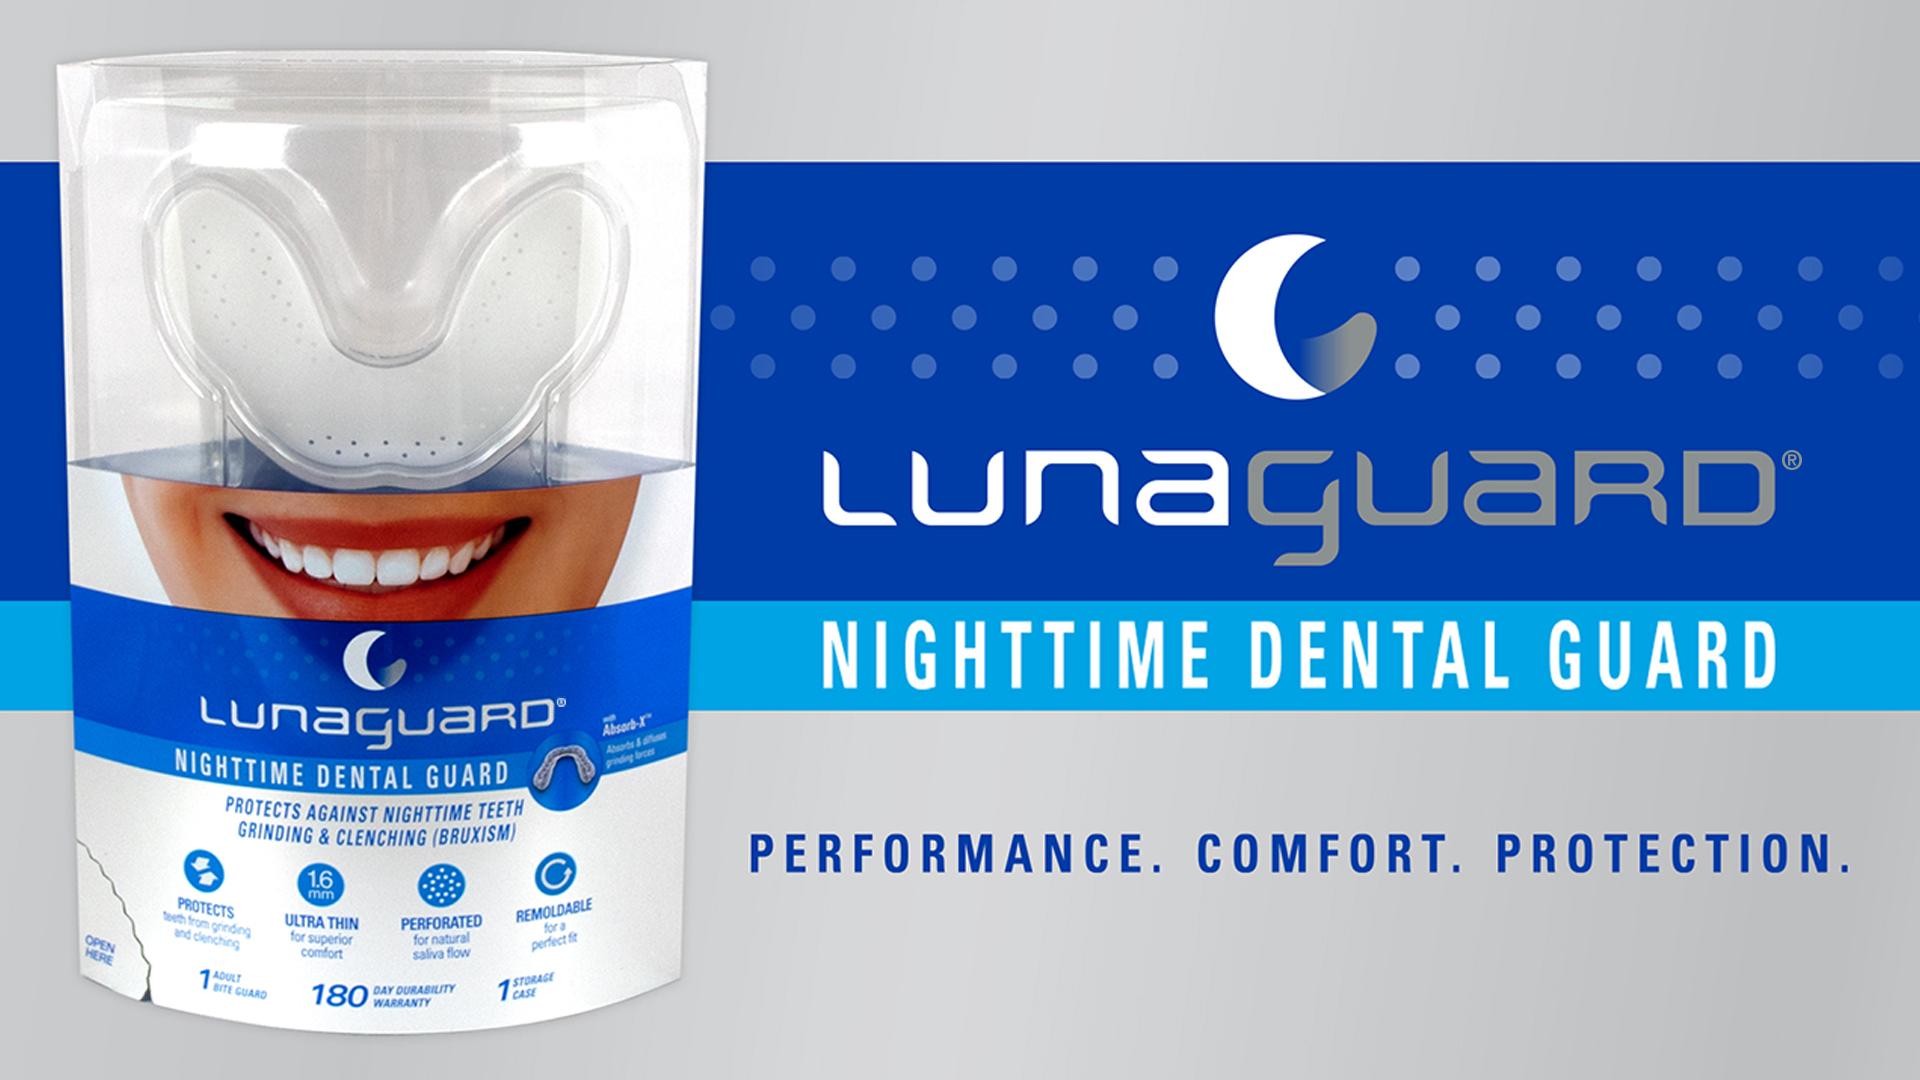 LunaGuard-How-To-Use